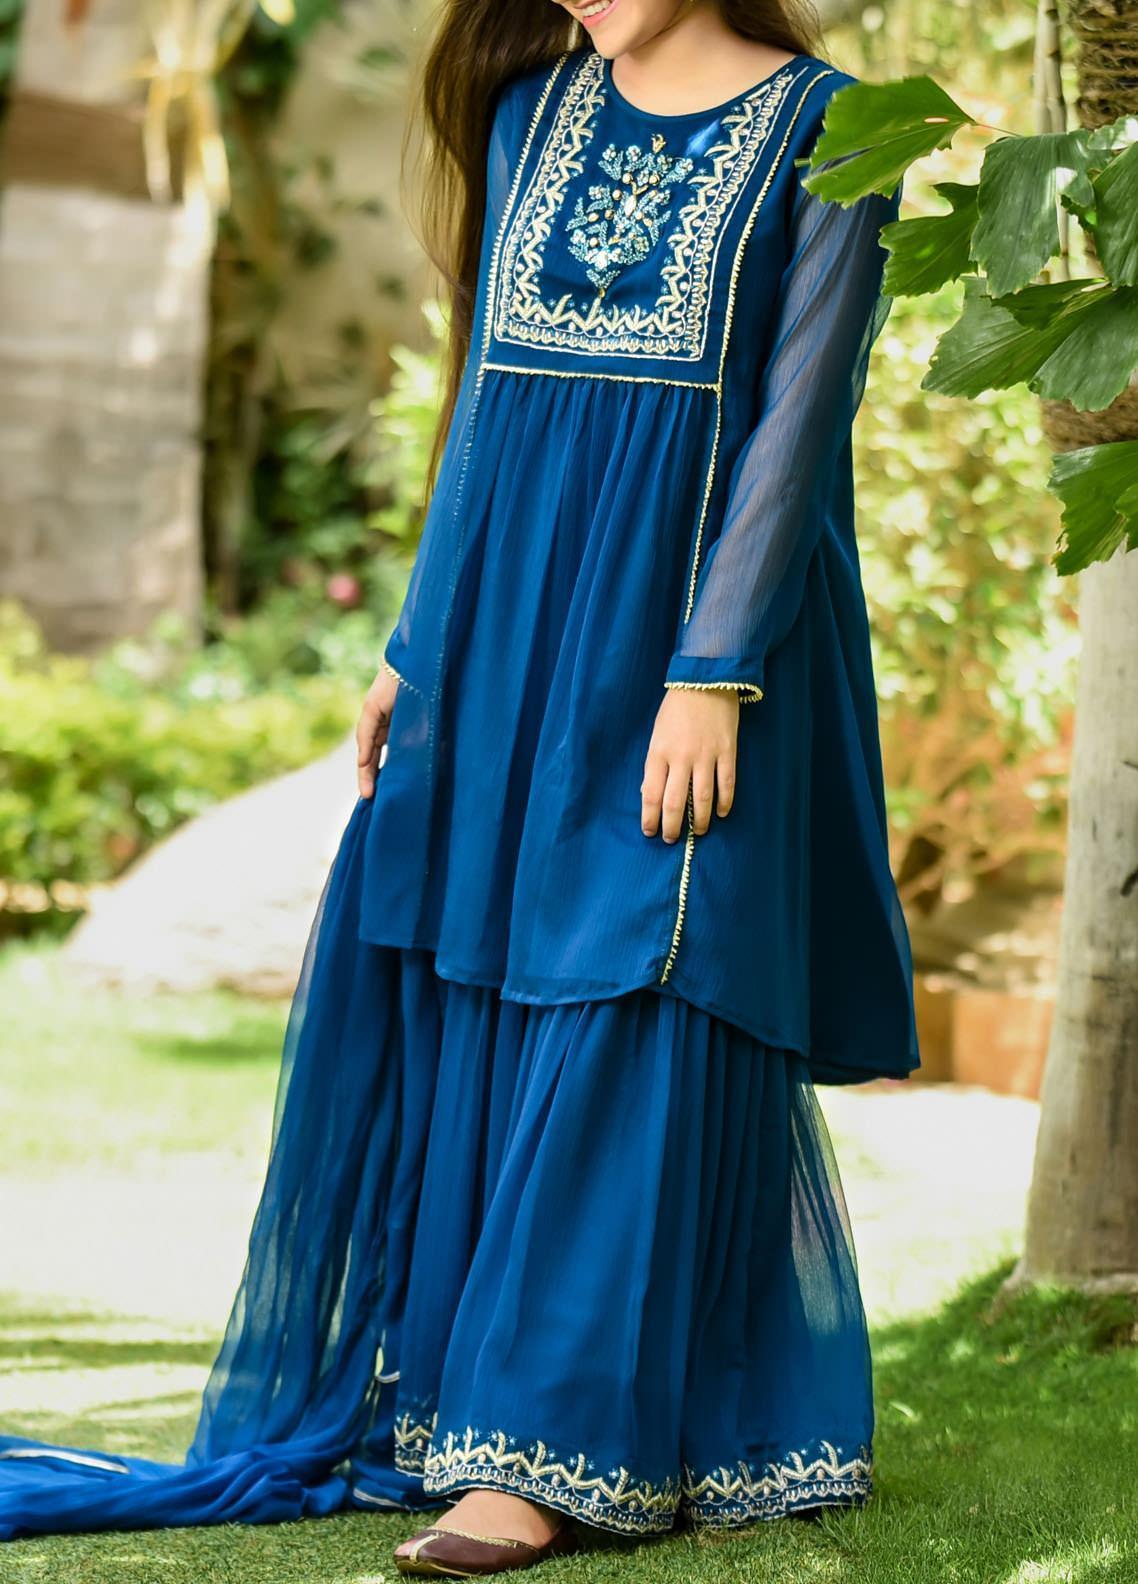 Ochre Chiffon Fancy 3 Piece Suit for Girls -  OFW 282  Teal Blue